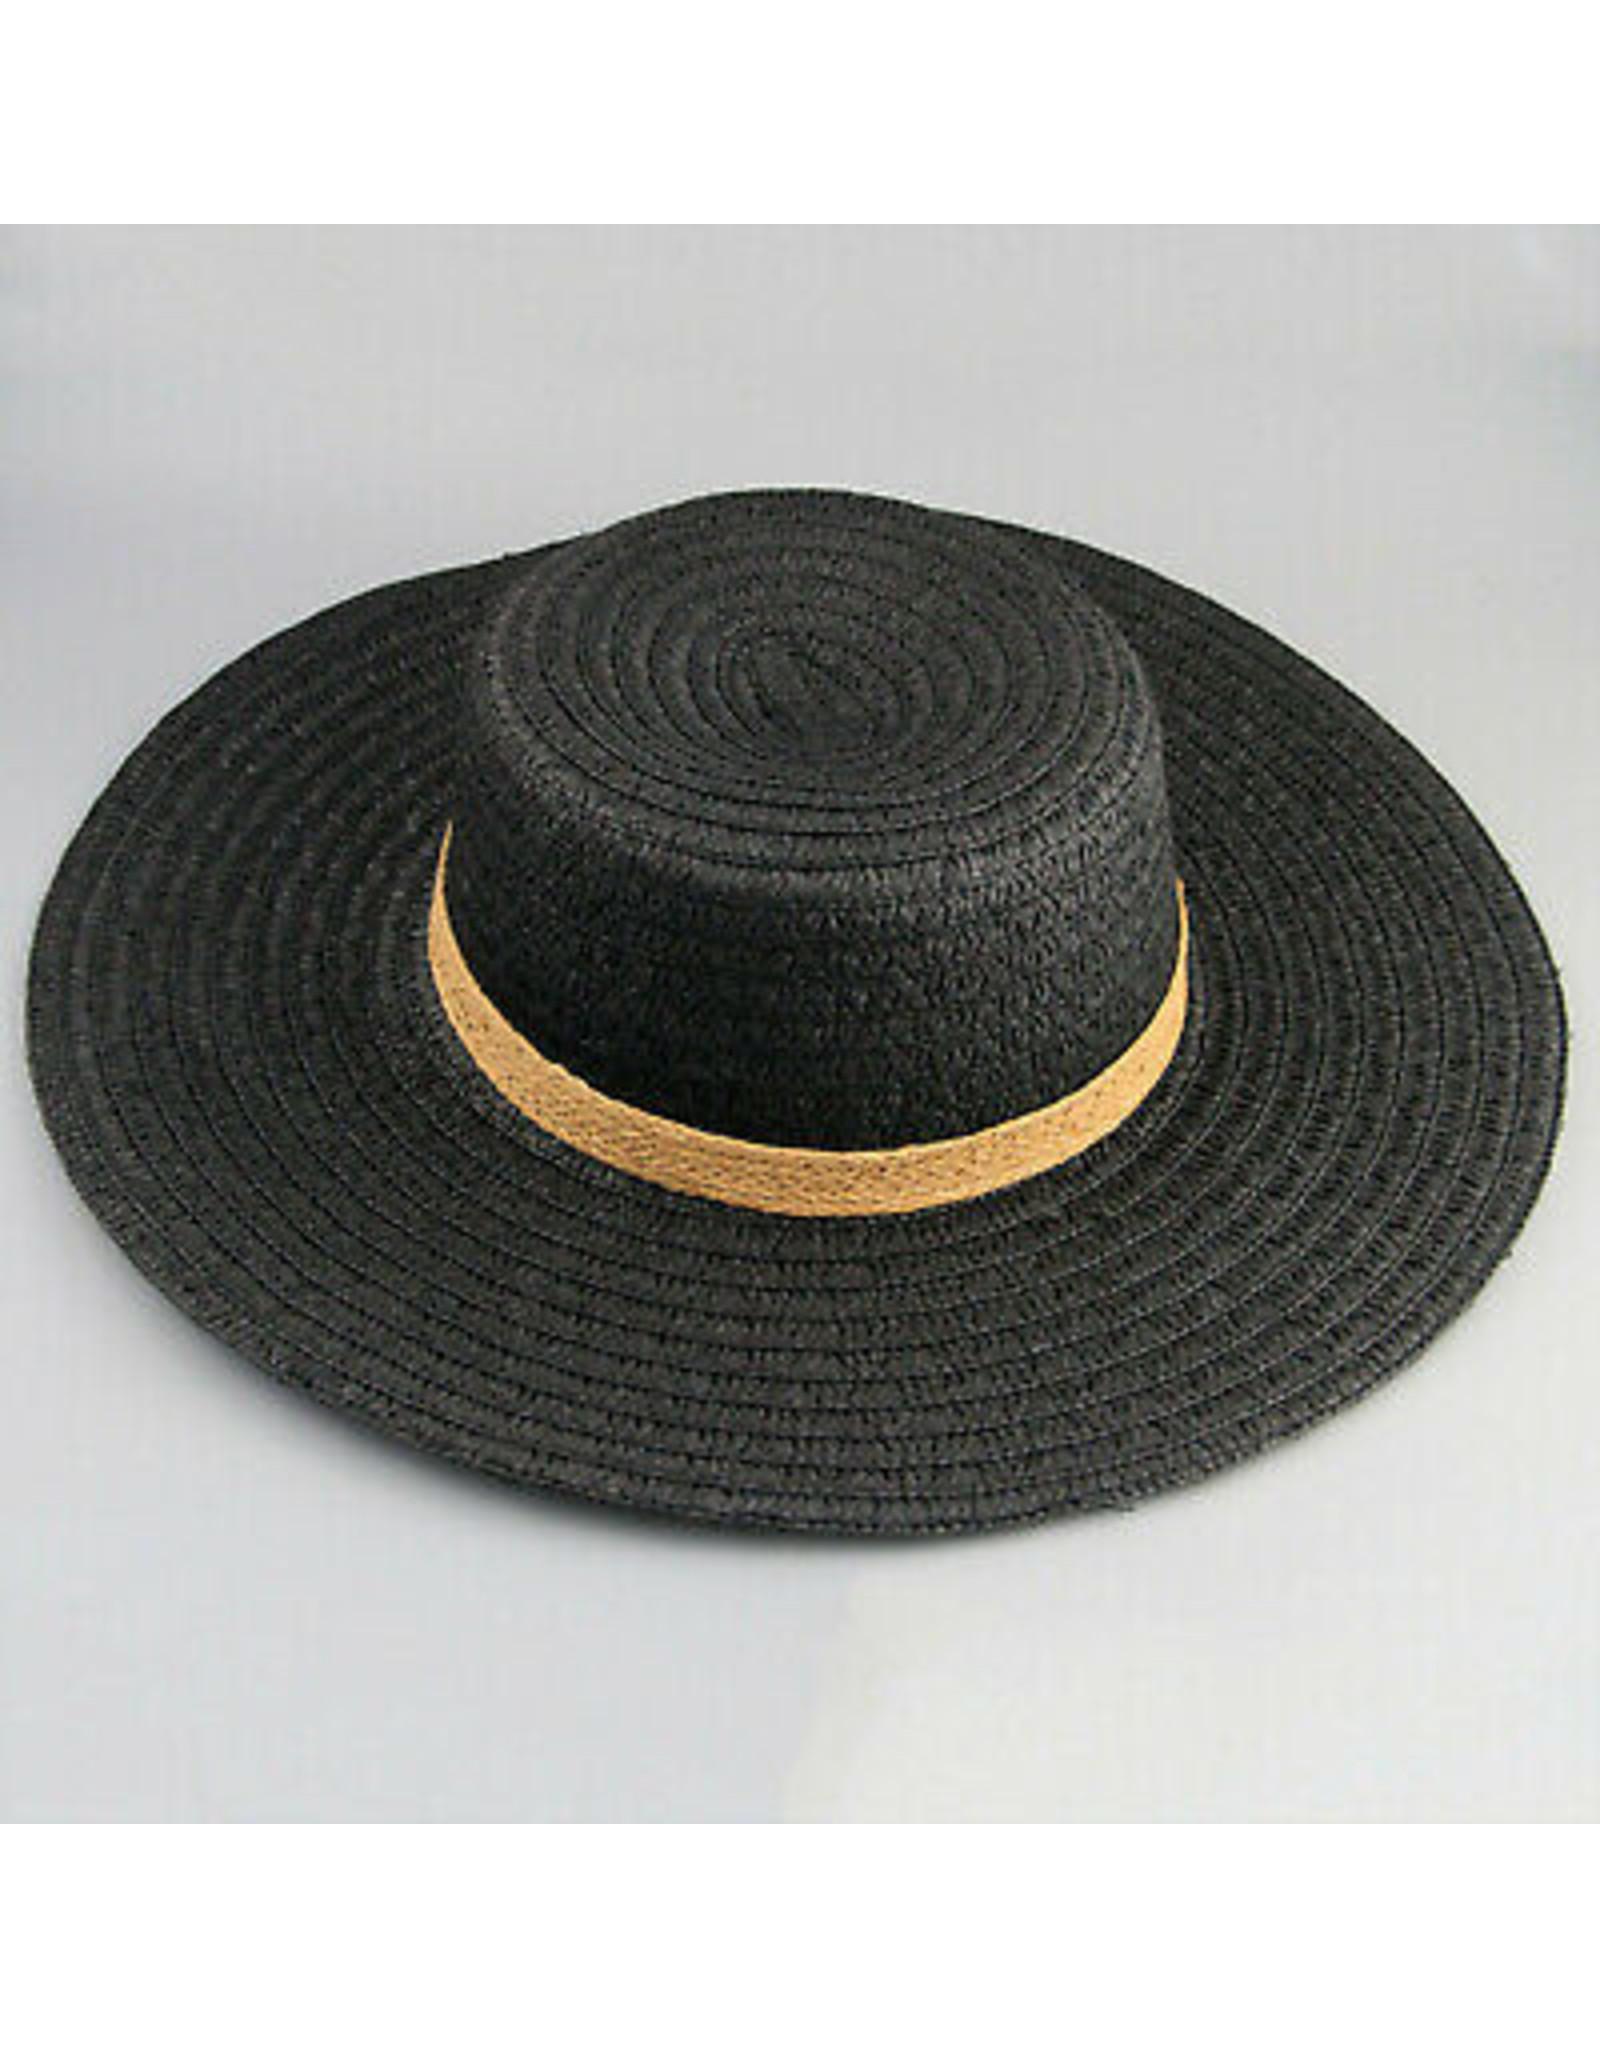 KOORINGAL HWL-0392 WOMEN'S WIDE-BRIM HAT - ADALITA